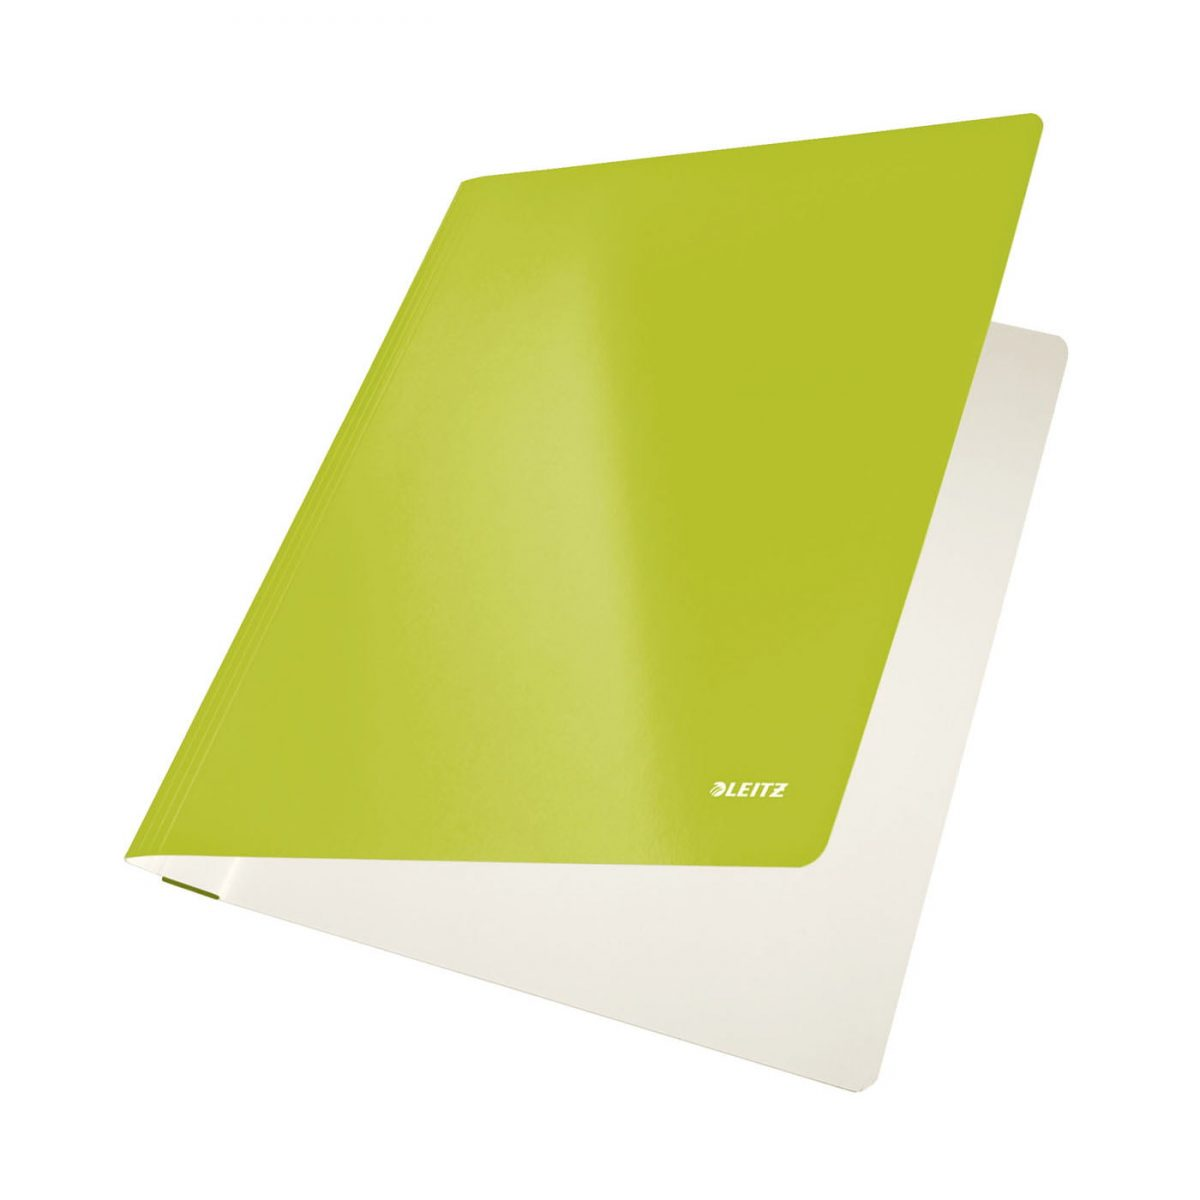 Dosar carton LEITZ Wow cu sina, capacitate 250 coli - verde metalizat